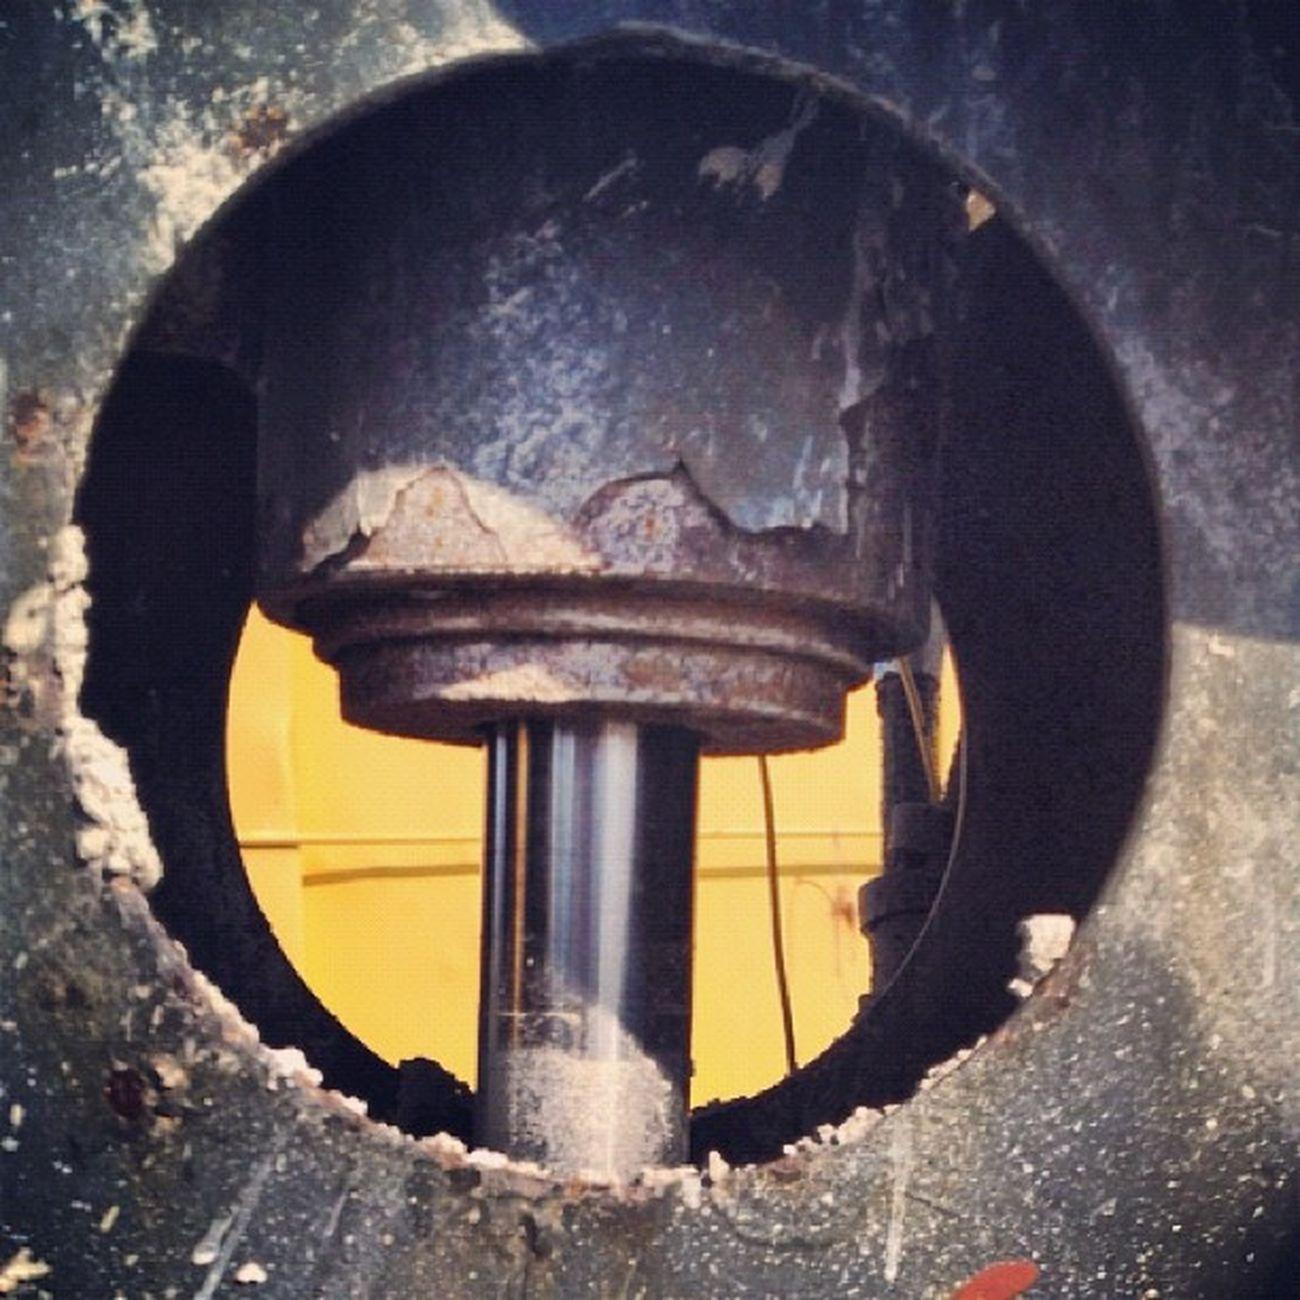 #crane #instagood #gang_family #nj #southjersey #capemaycounty #heavyequipment #piston #metal Crane Metal Gang_family Nj Instagood Southjersey Capemaycounty Heavyequipment Piston